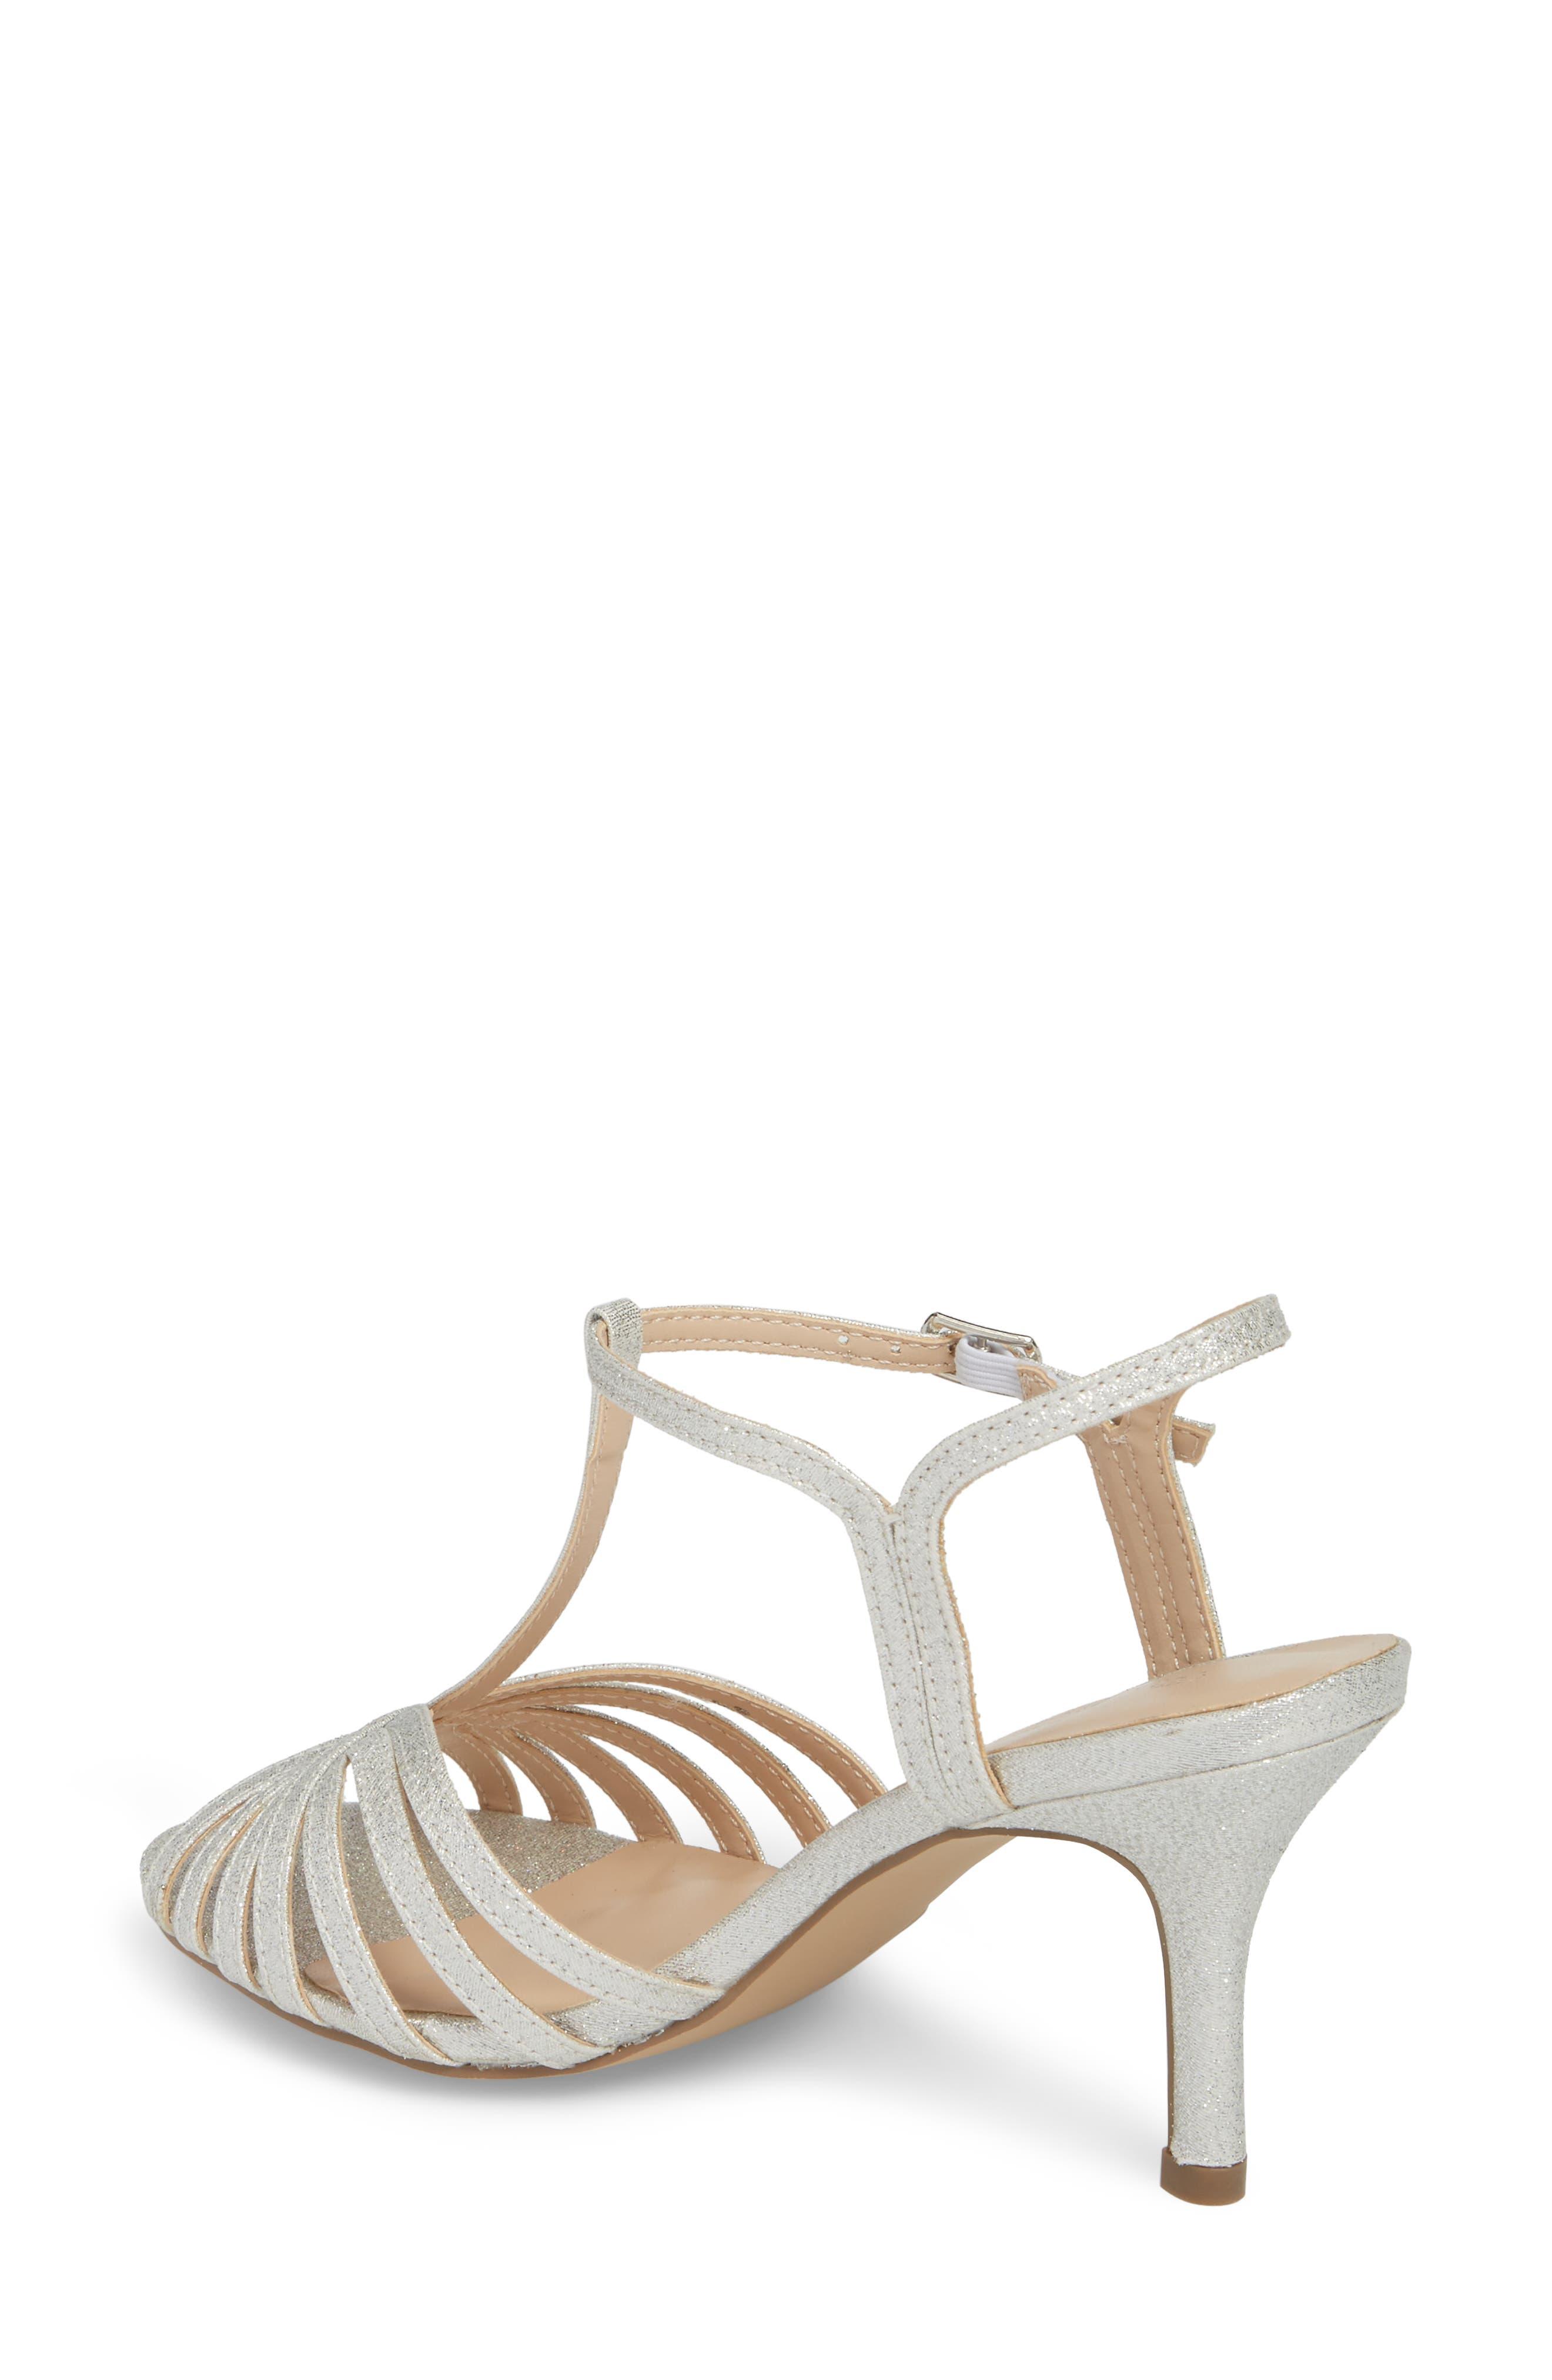 Maggie T-Strap Sandal,                             Alternate thumbnail 2, color,                             Silver Glitter